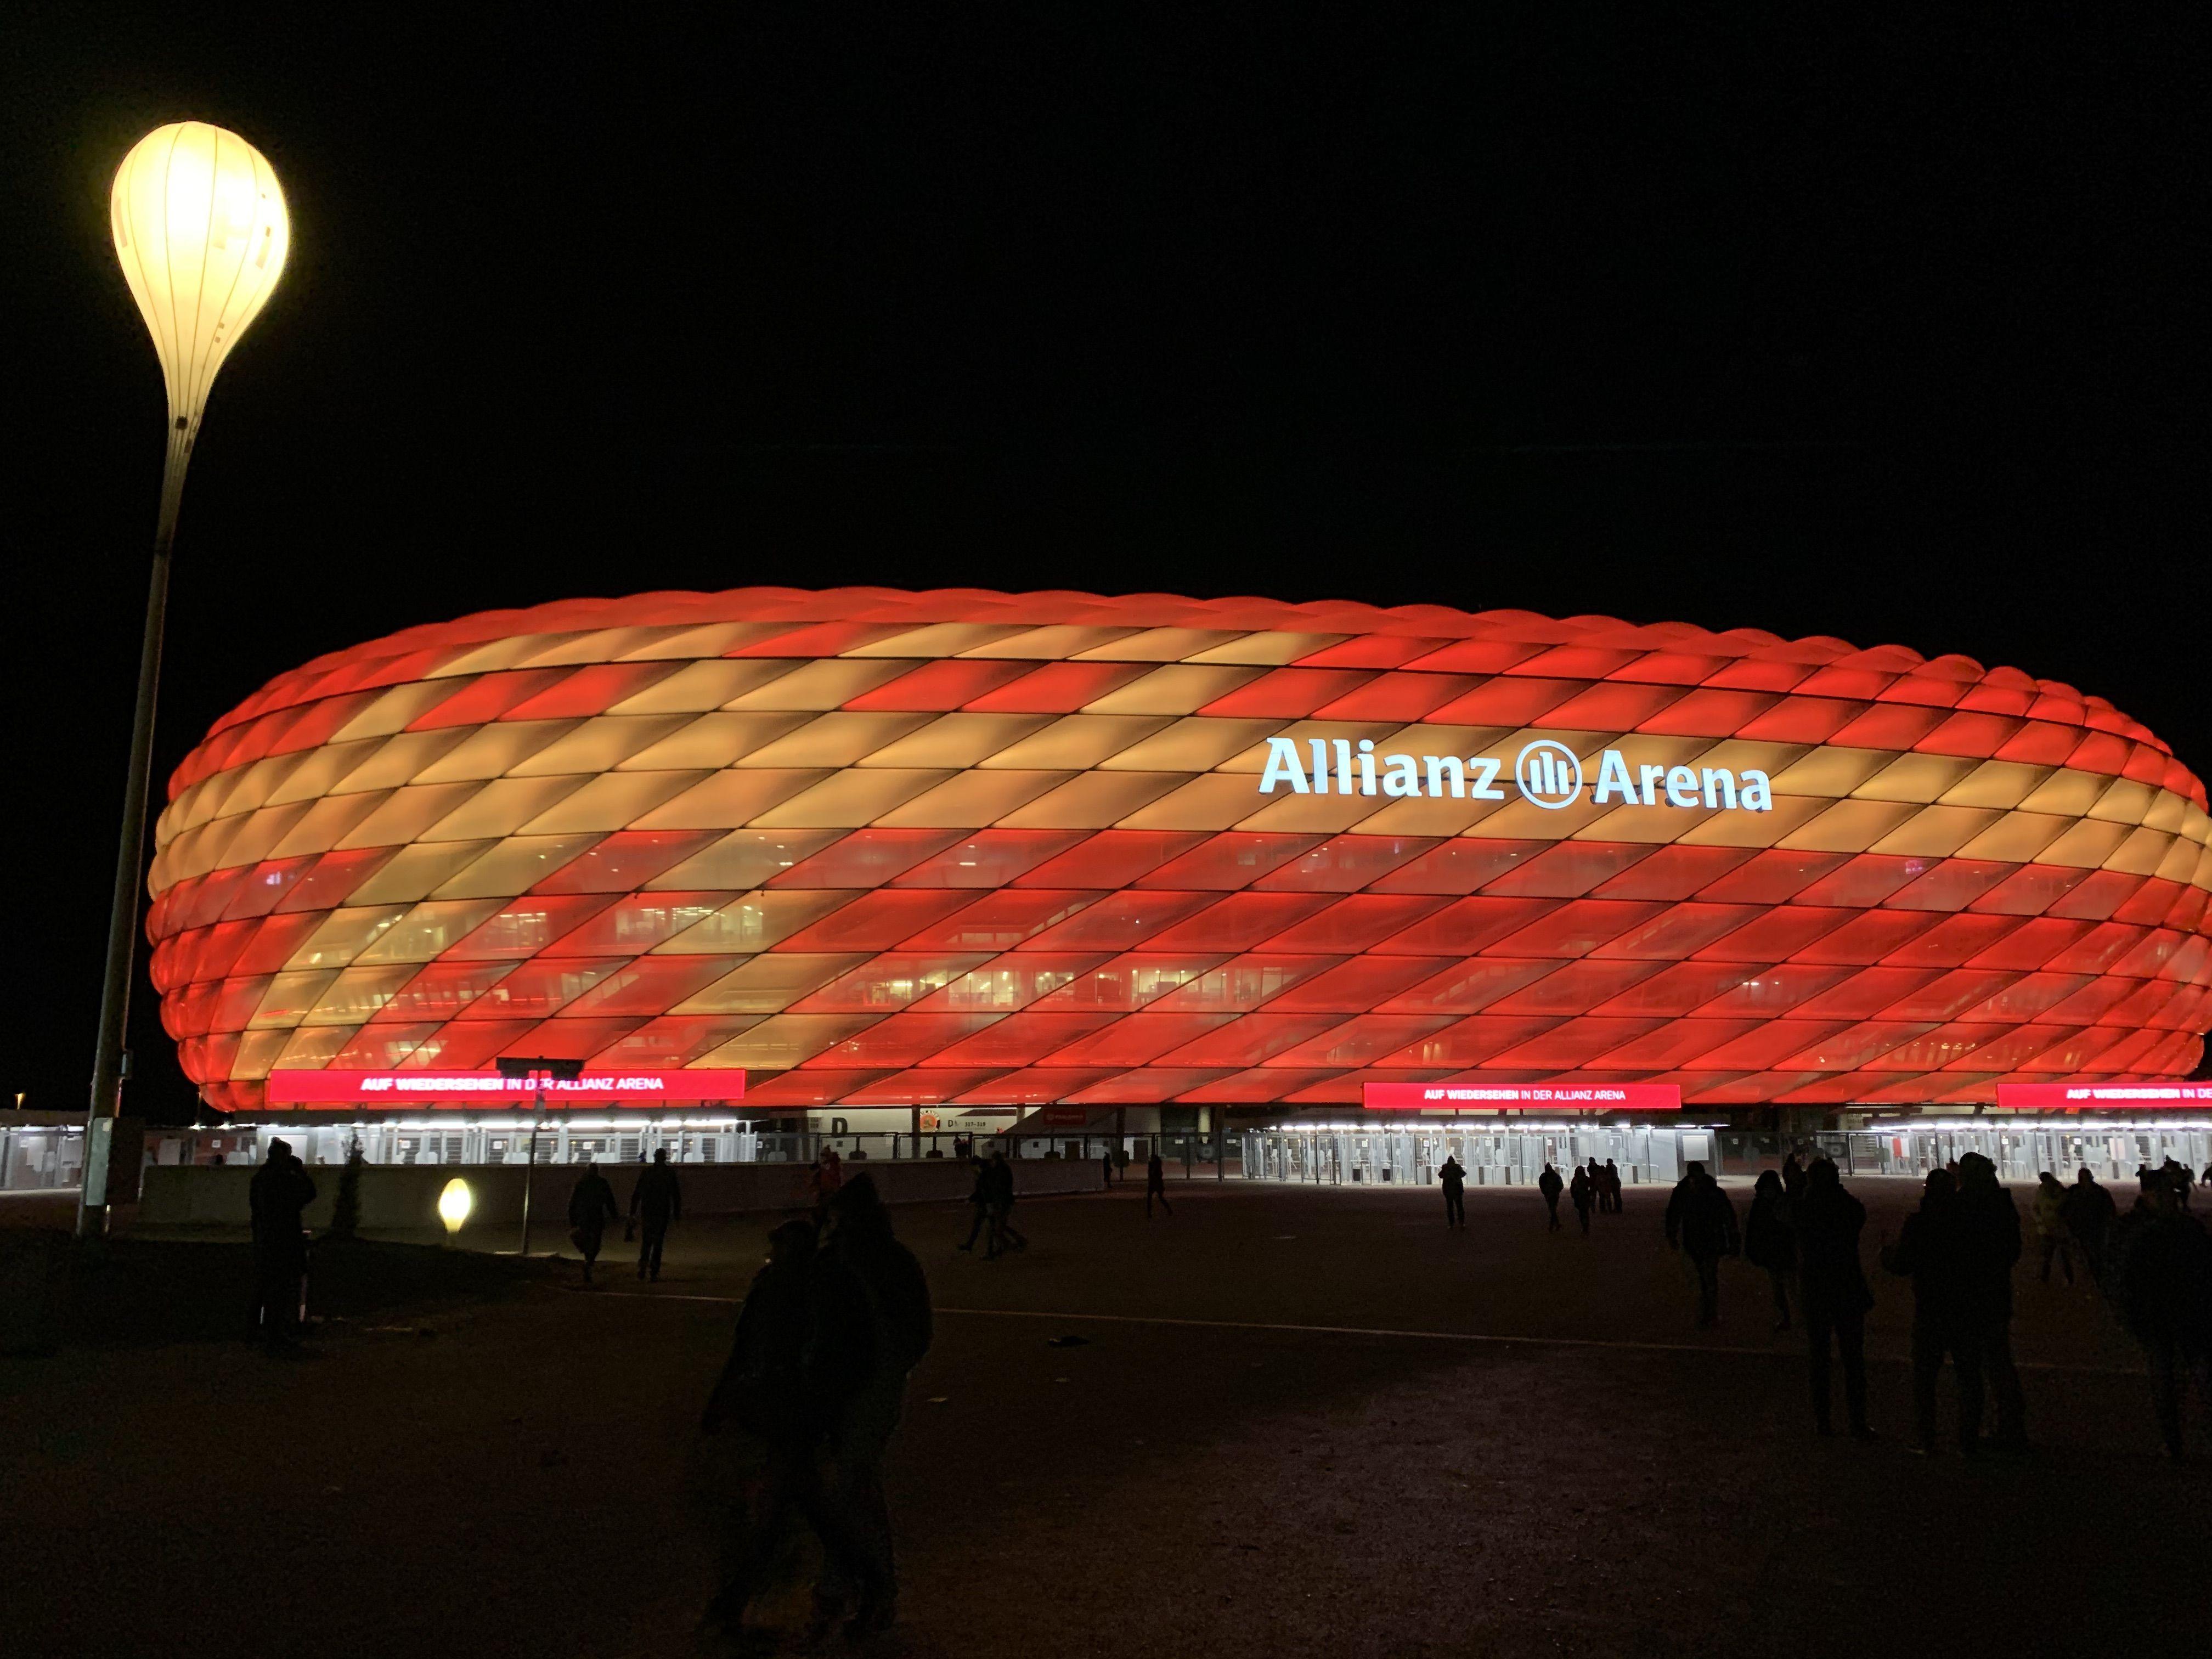 Allianz Arena in 2020 Allianz, Night, Arena